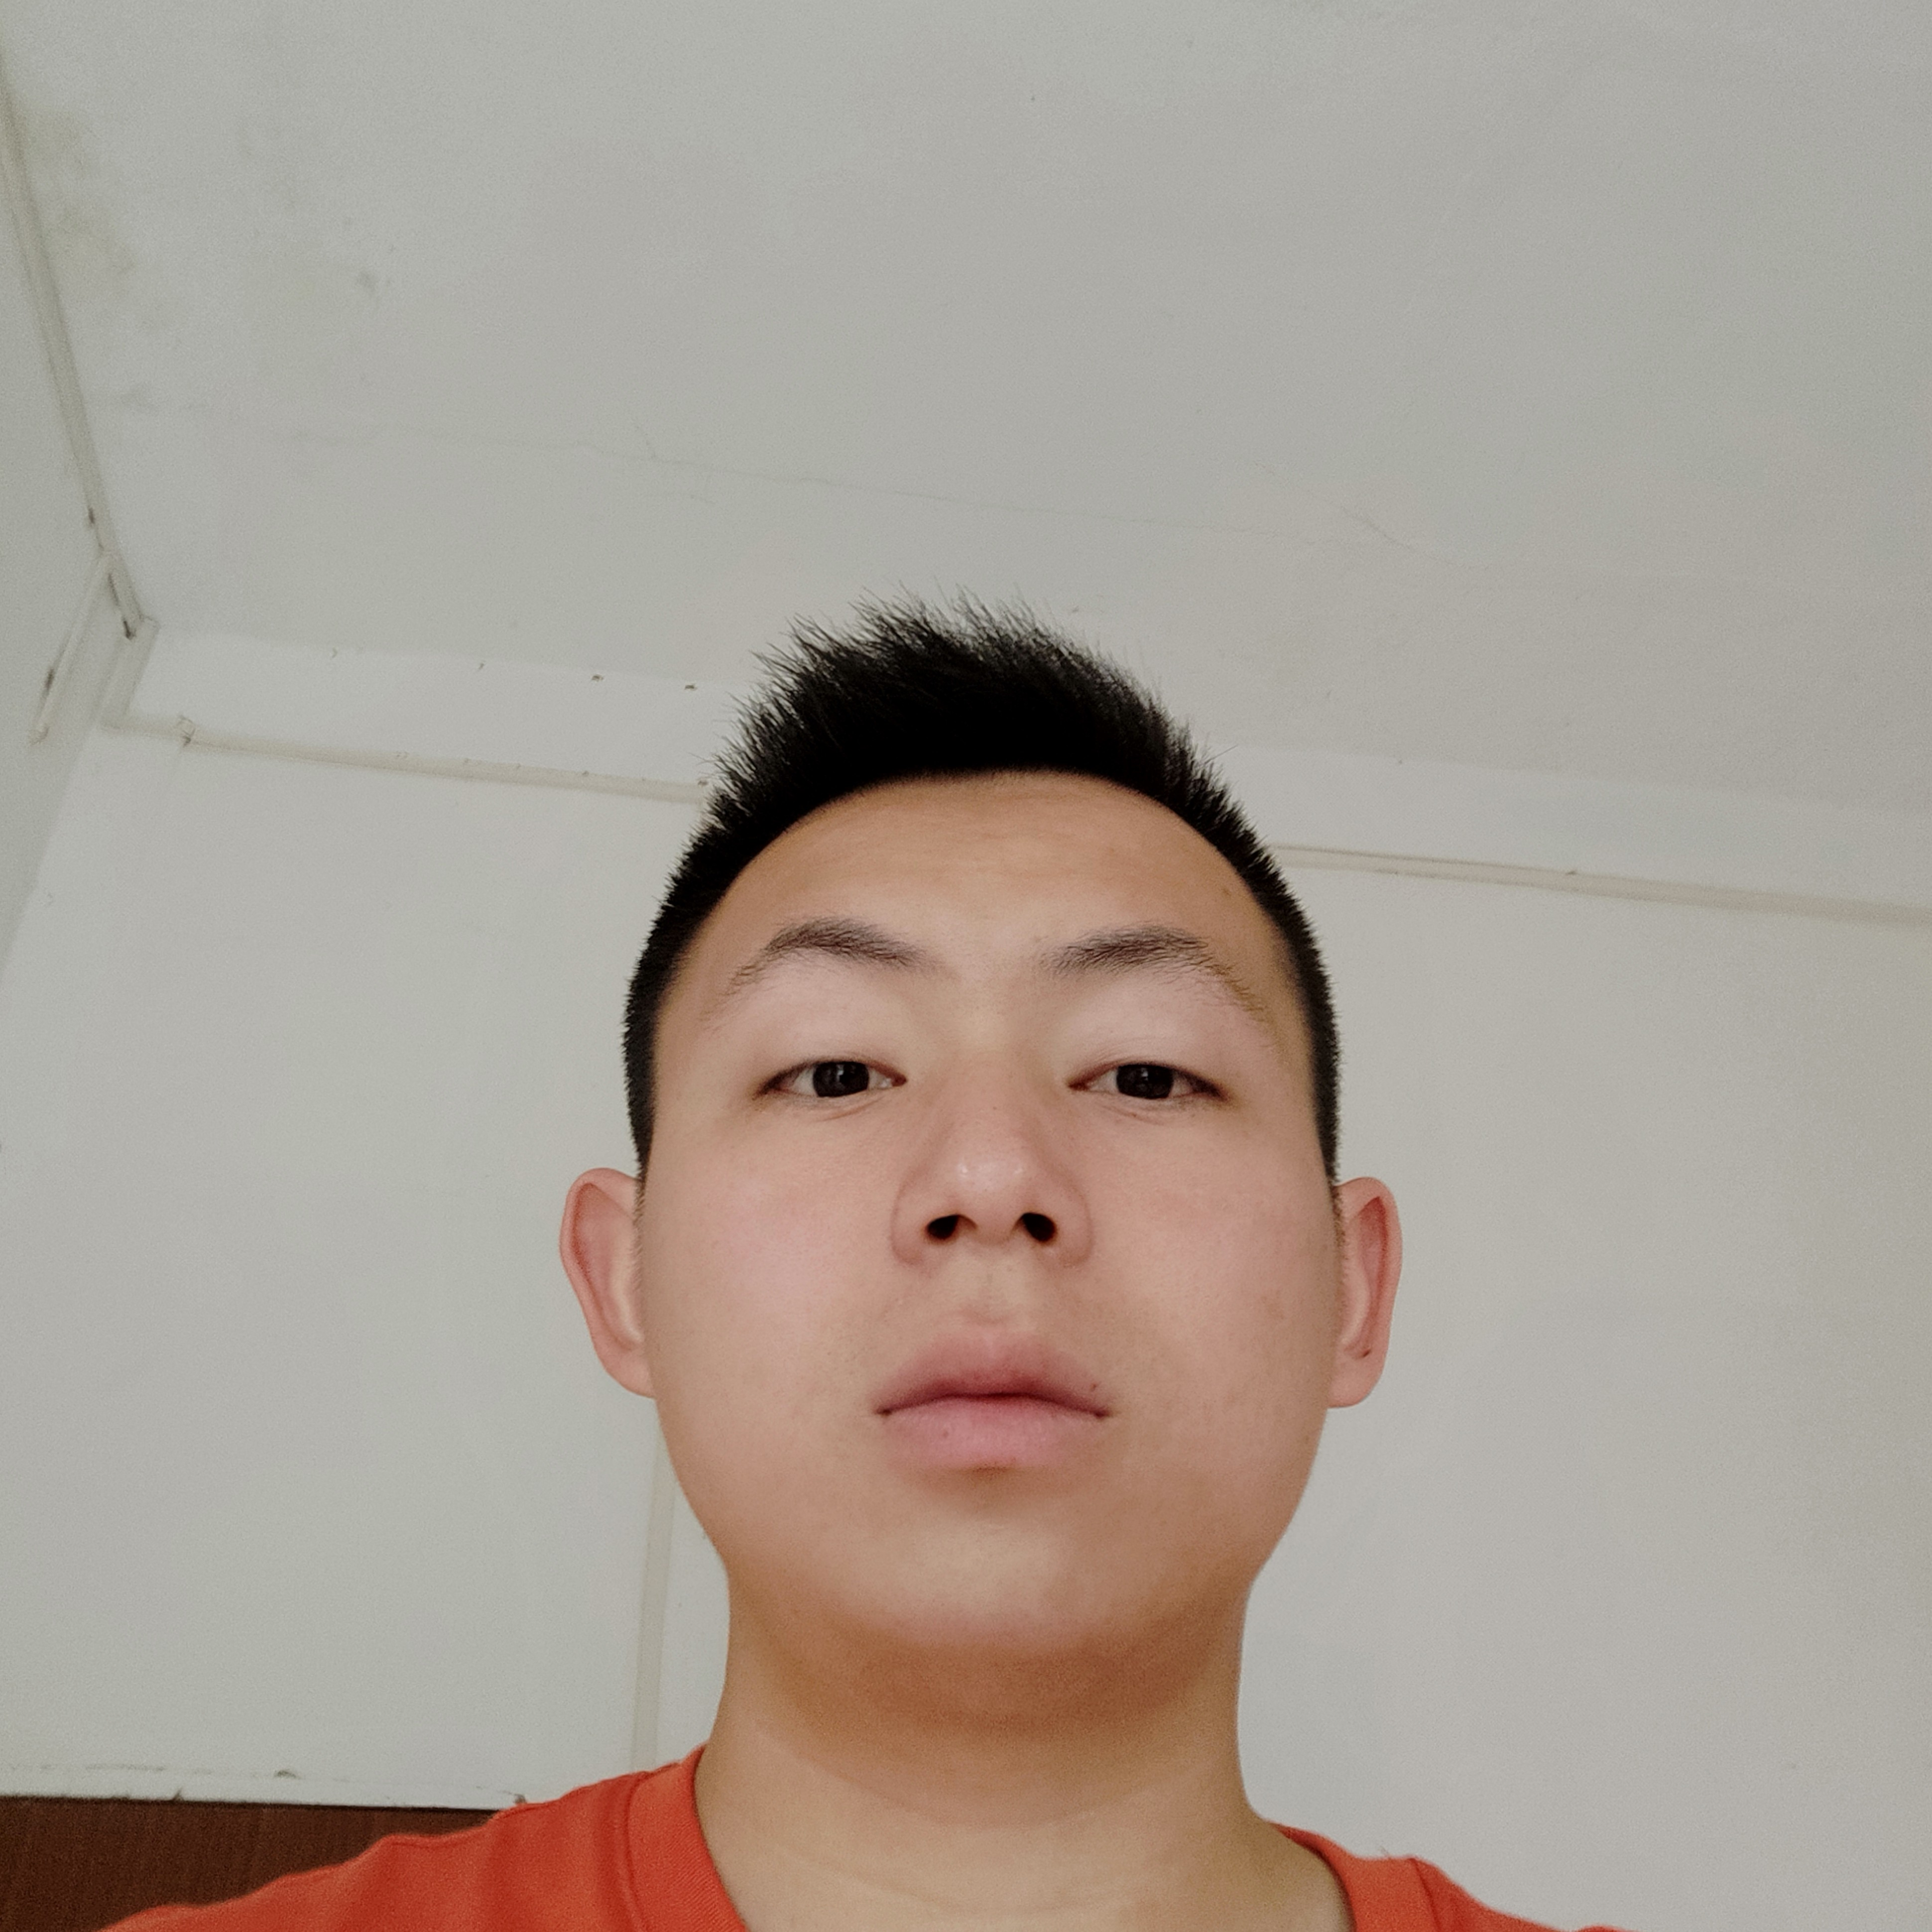 王秋鹏的照片